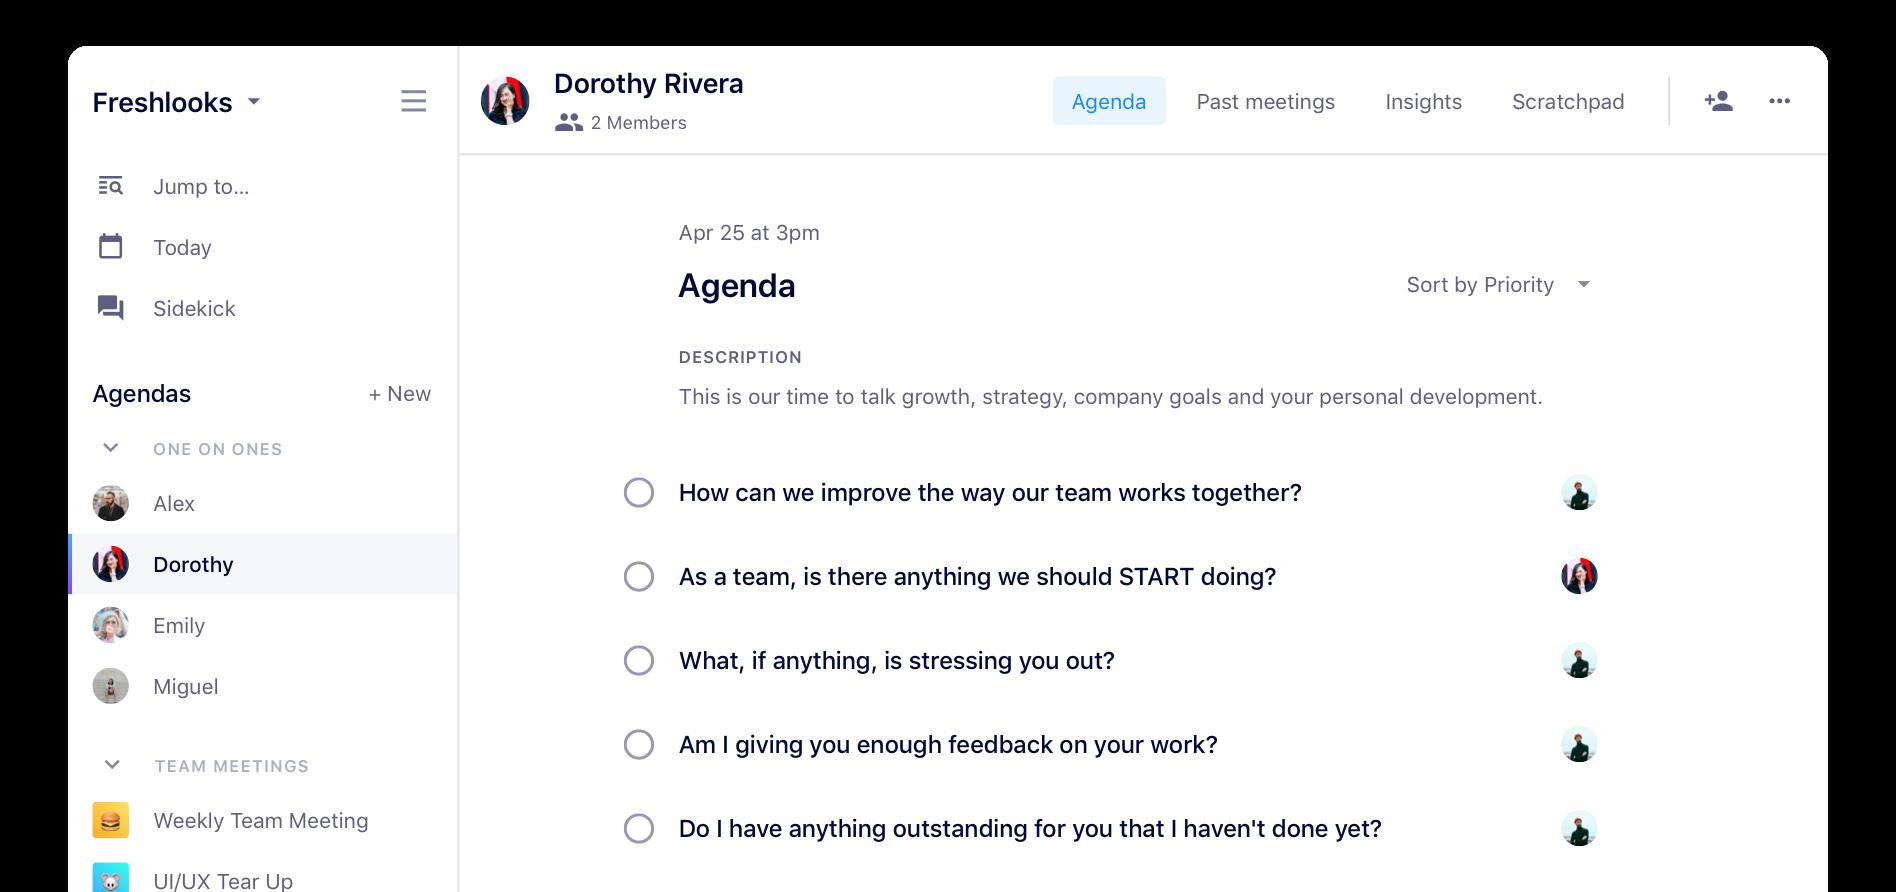 one-on-one meeting agenda